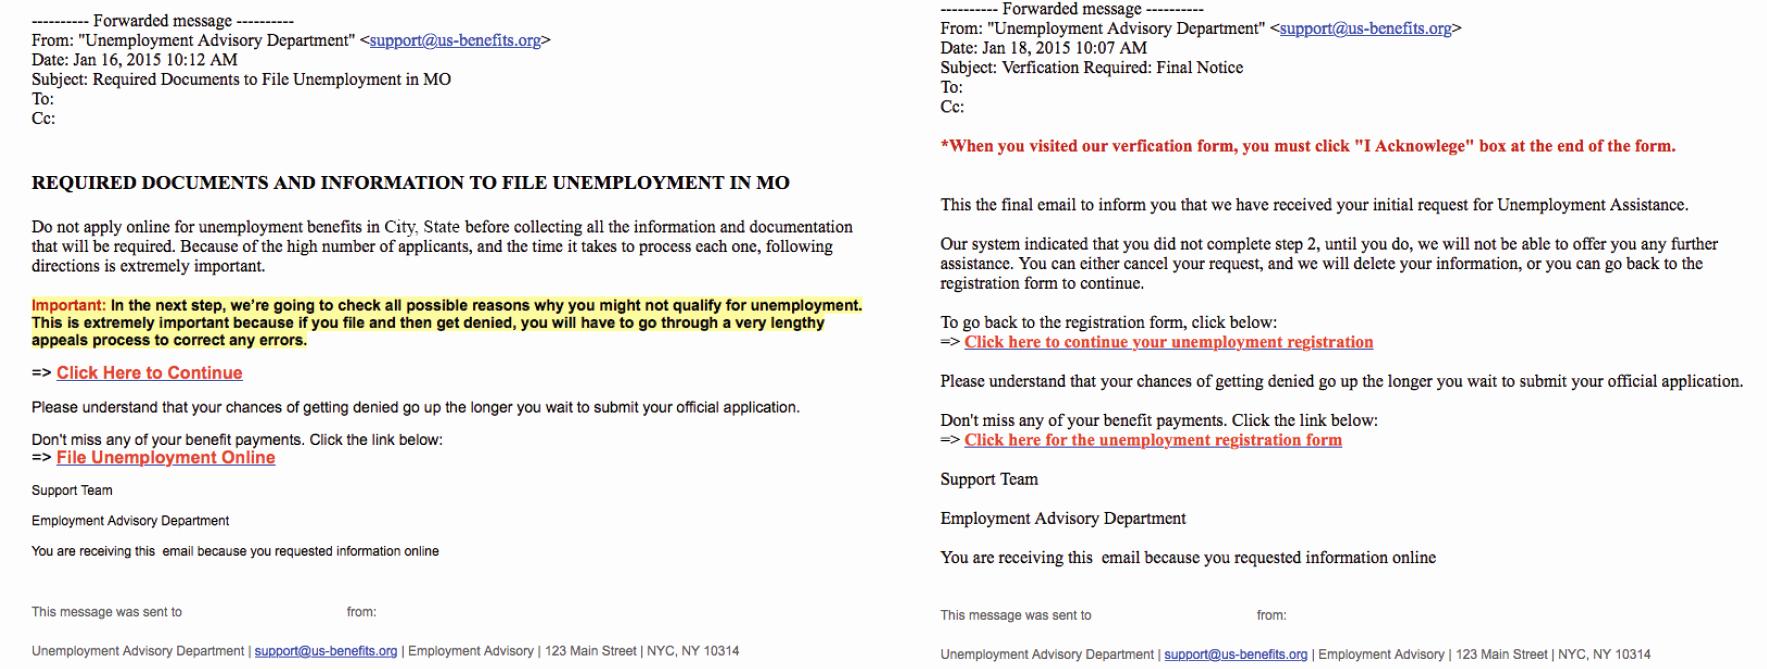 Sample Letter Protest Unemployment Benefits Beautiful Sample Letter Employer Protest Unemployment Benefits